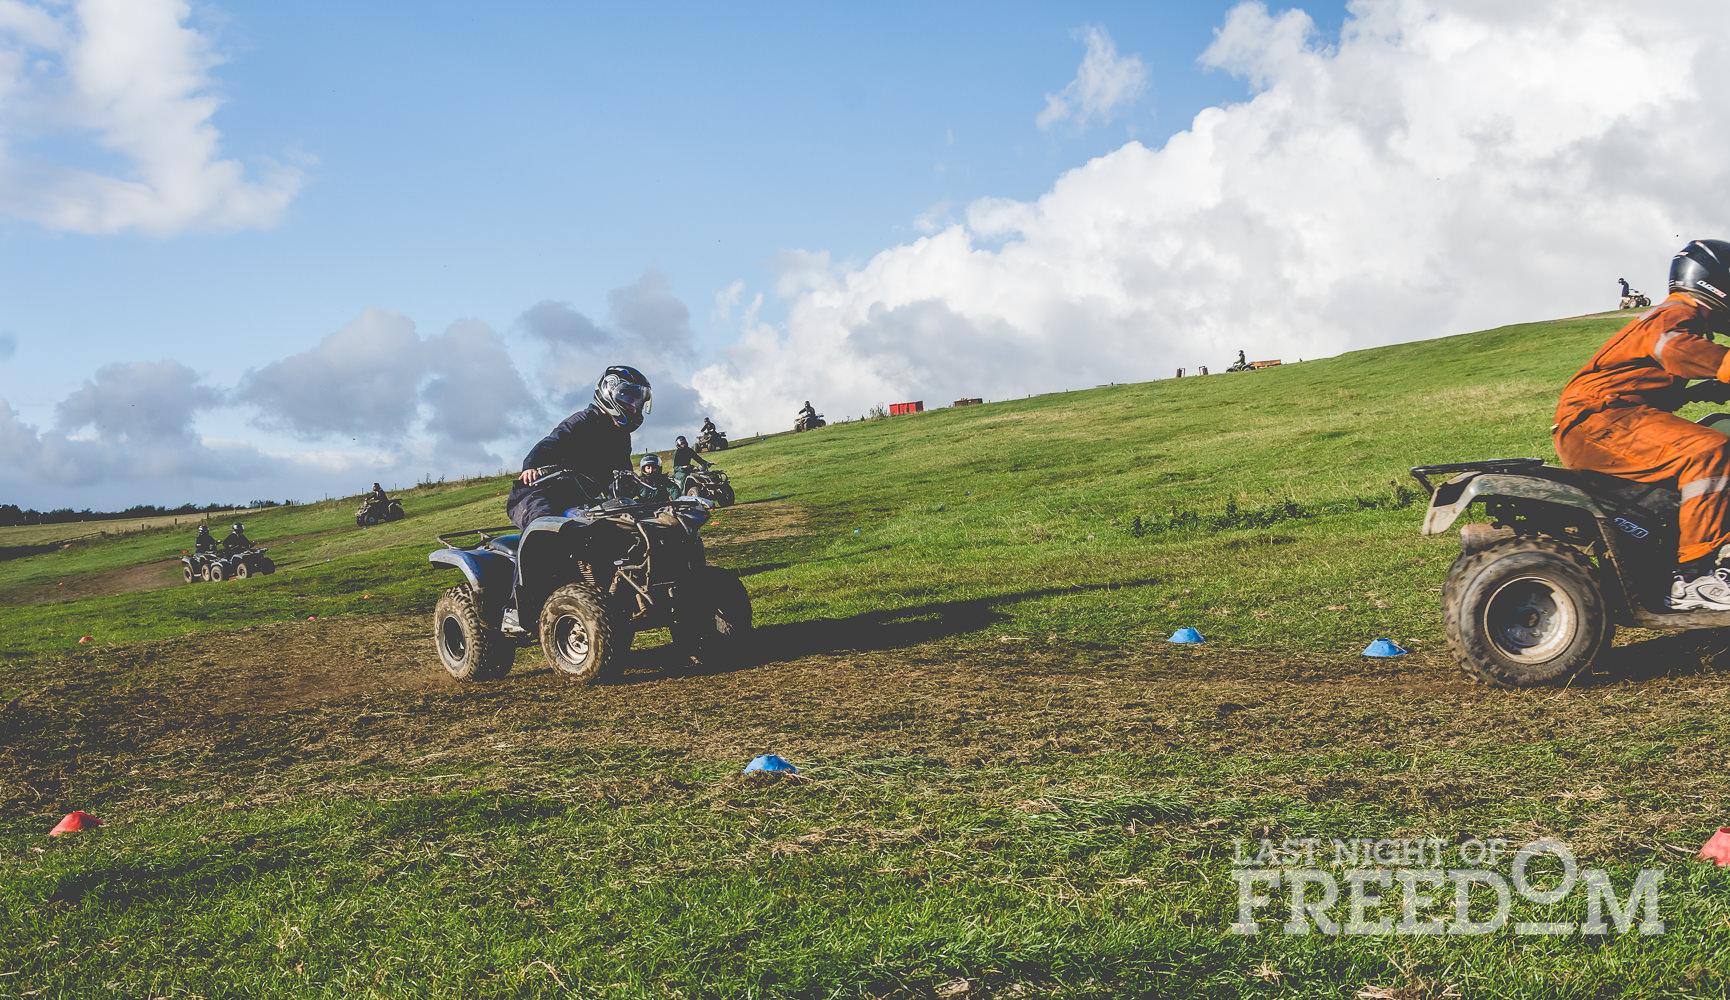 LNOF staff racing quads